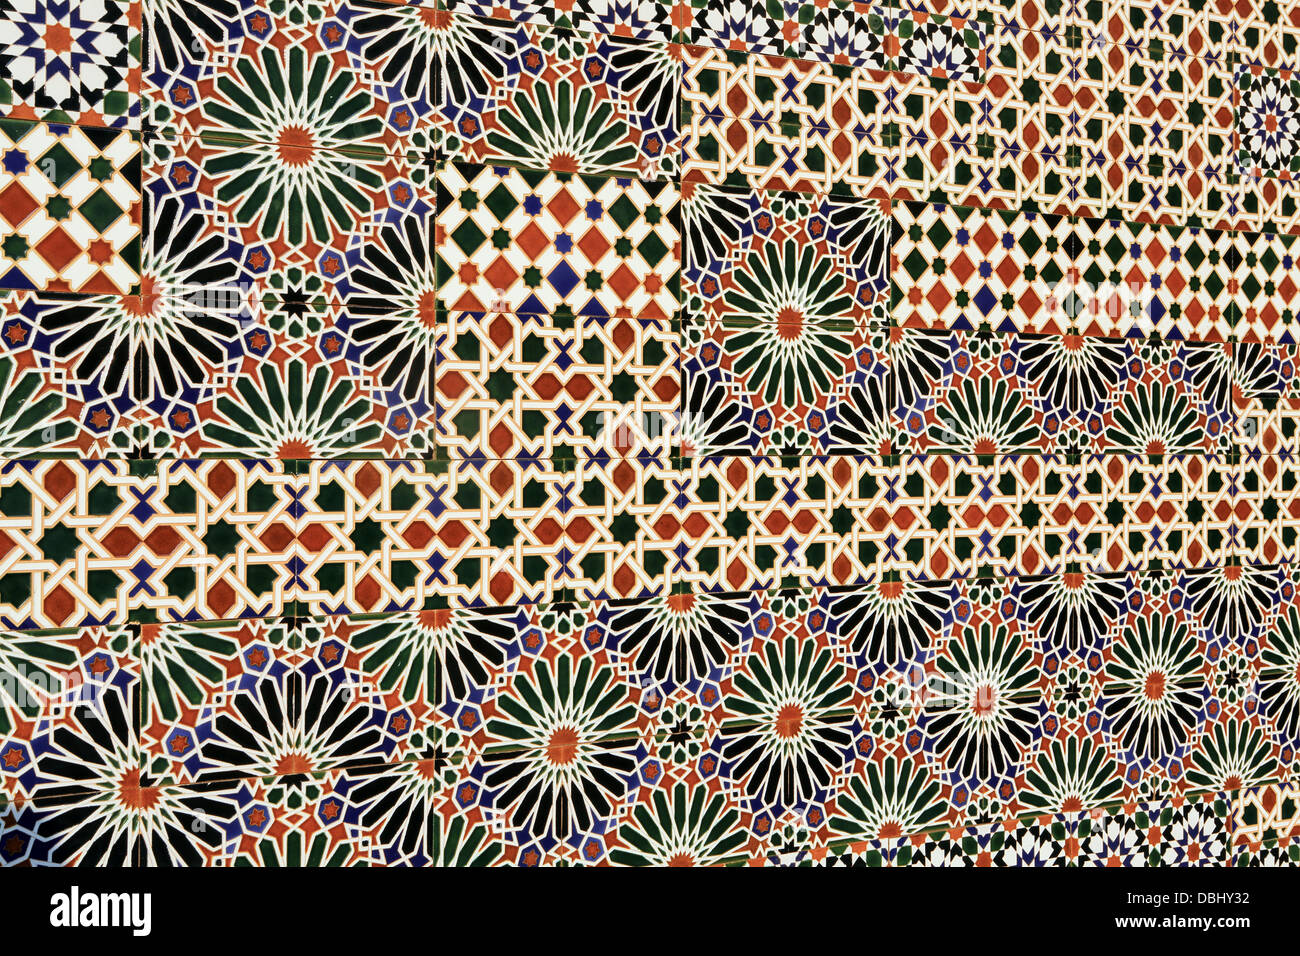 Ceramic wall tiles exterior public mural, Toledo, Spain - Stock Image